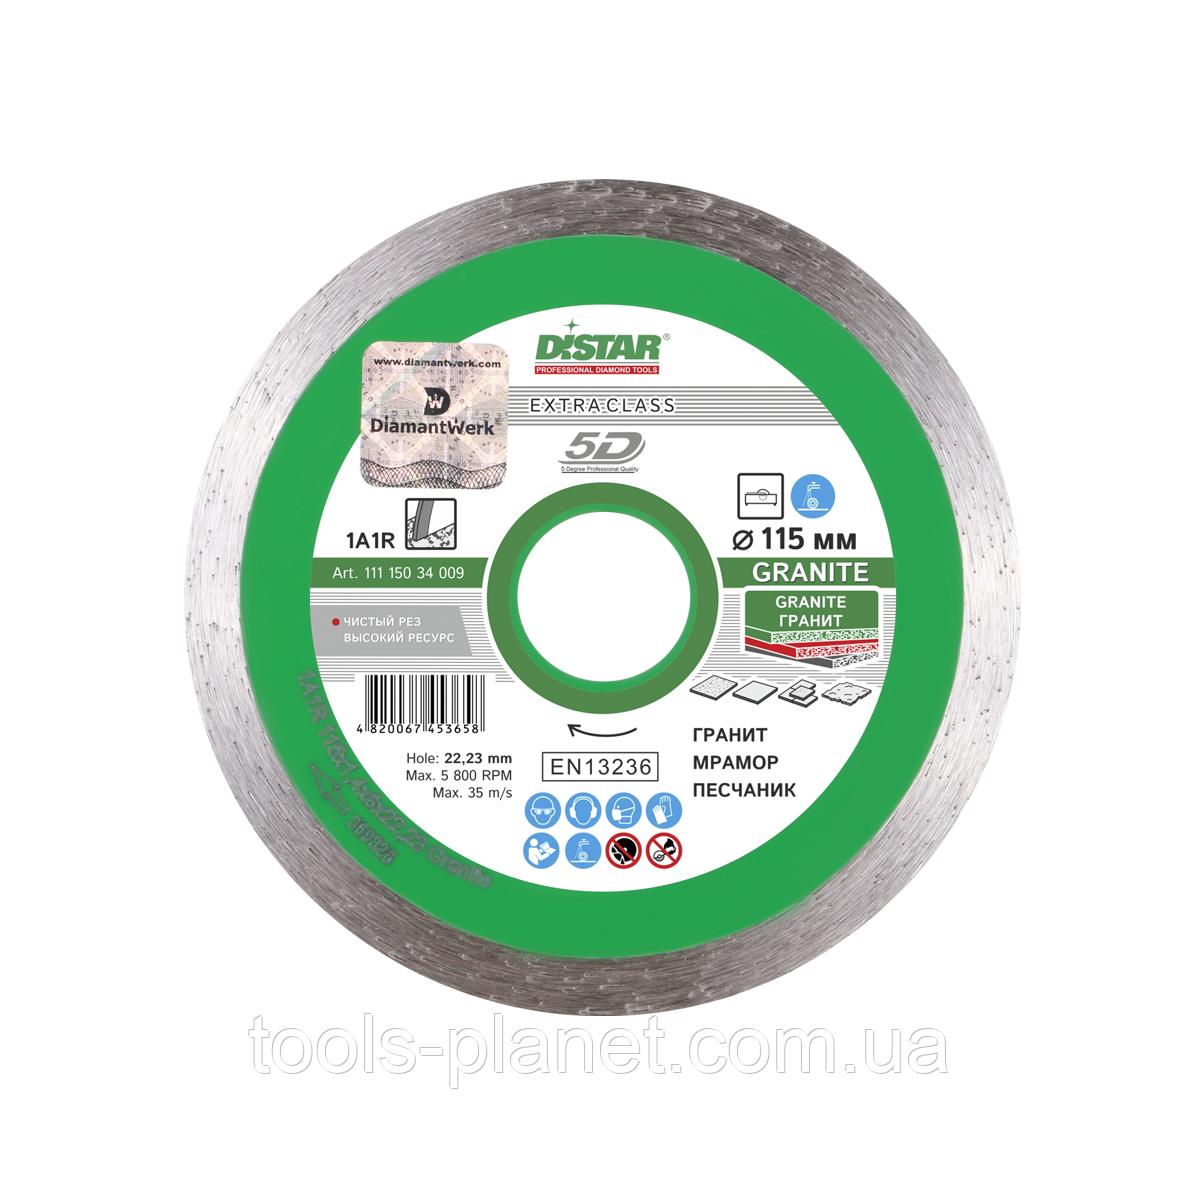 Алмазный диск Distar 1A1R 115 x 1,4 x 10 x 22,23 Granite 5D (11115034009)